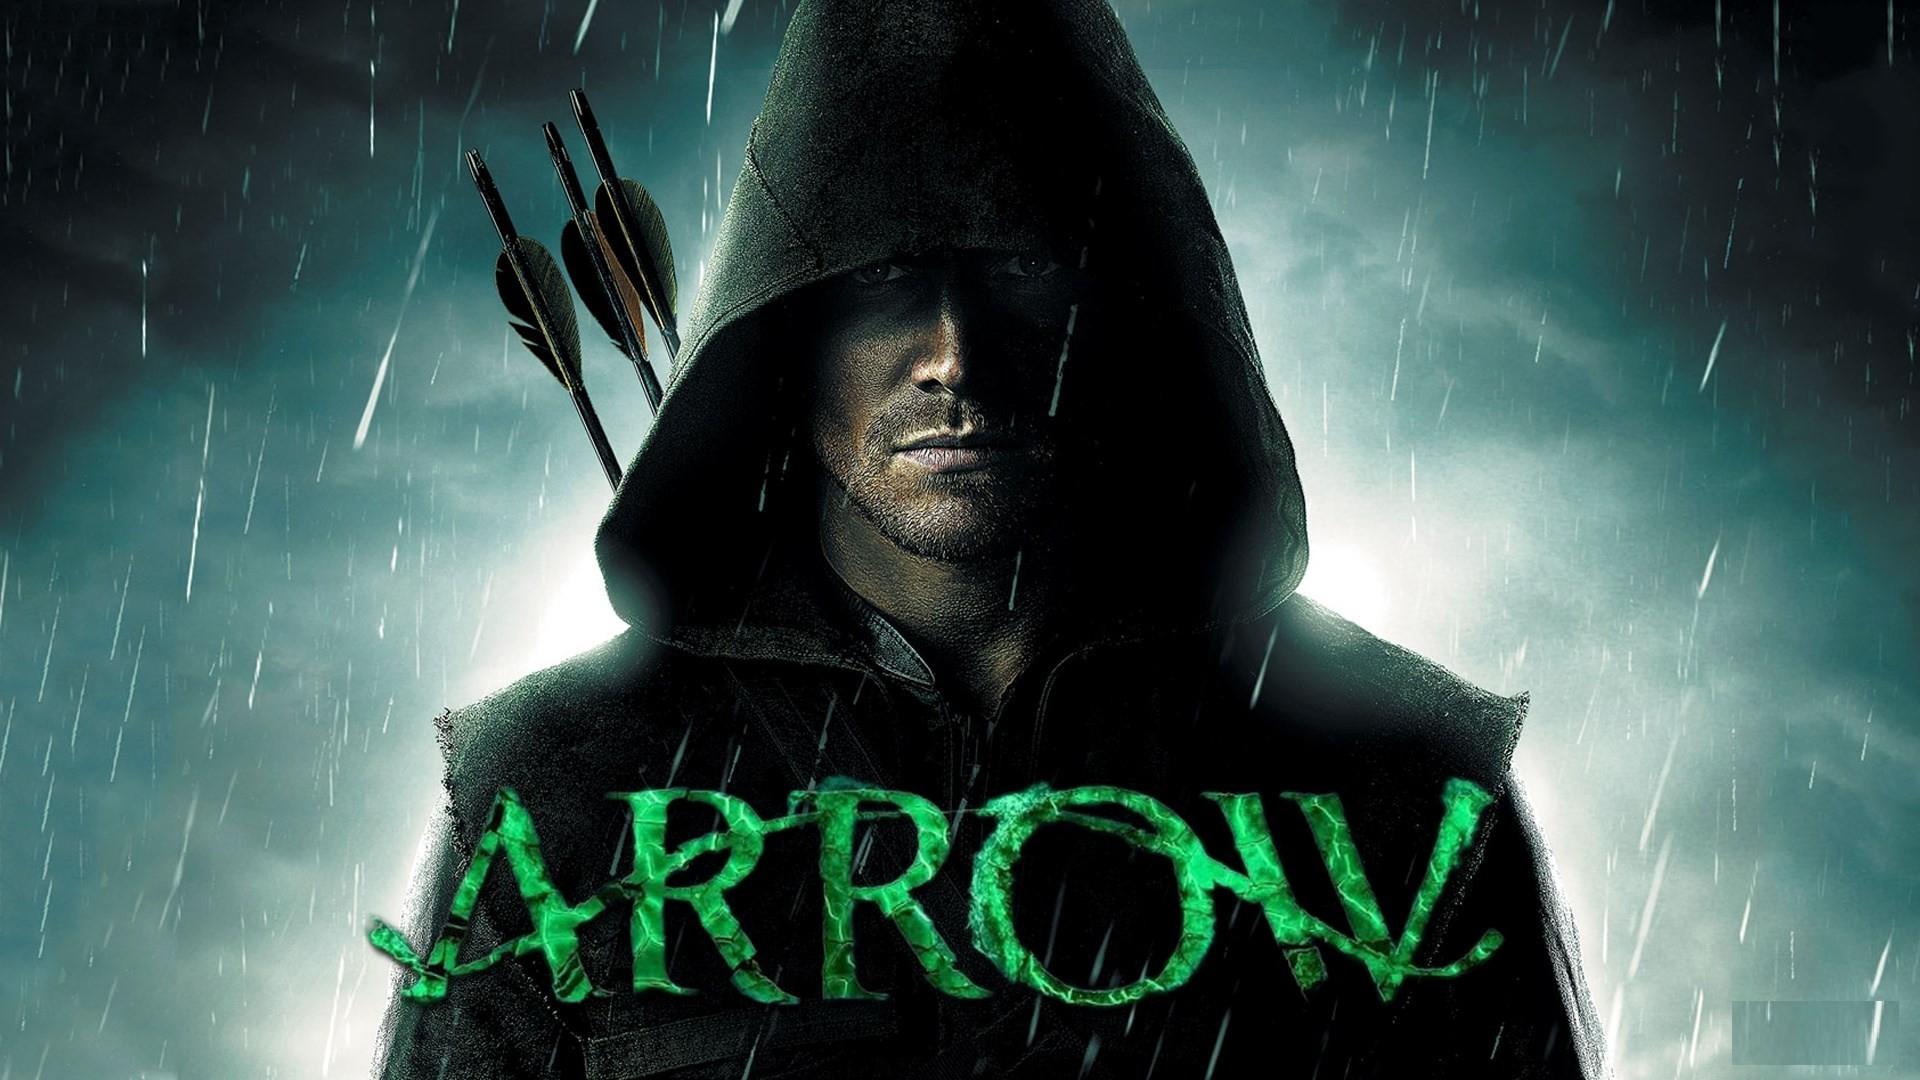 arrow wallpaper hd background download desktop